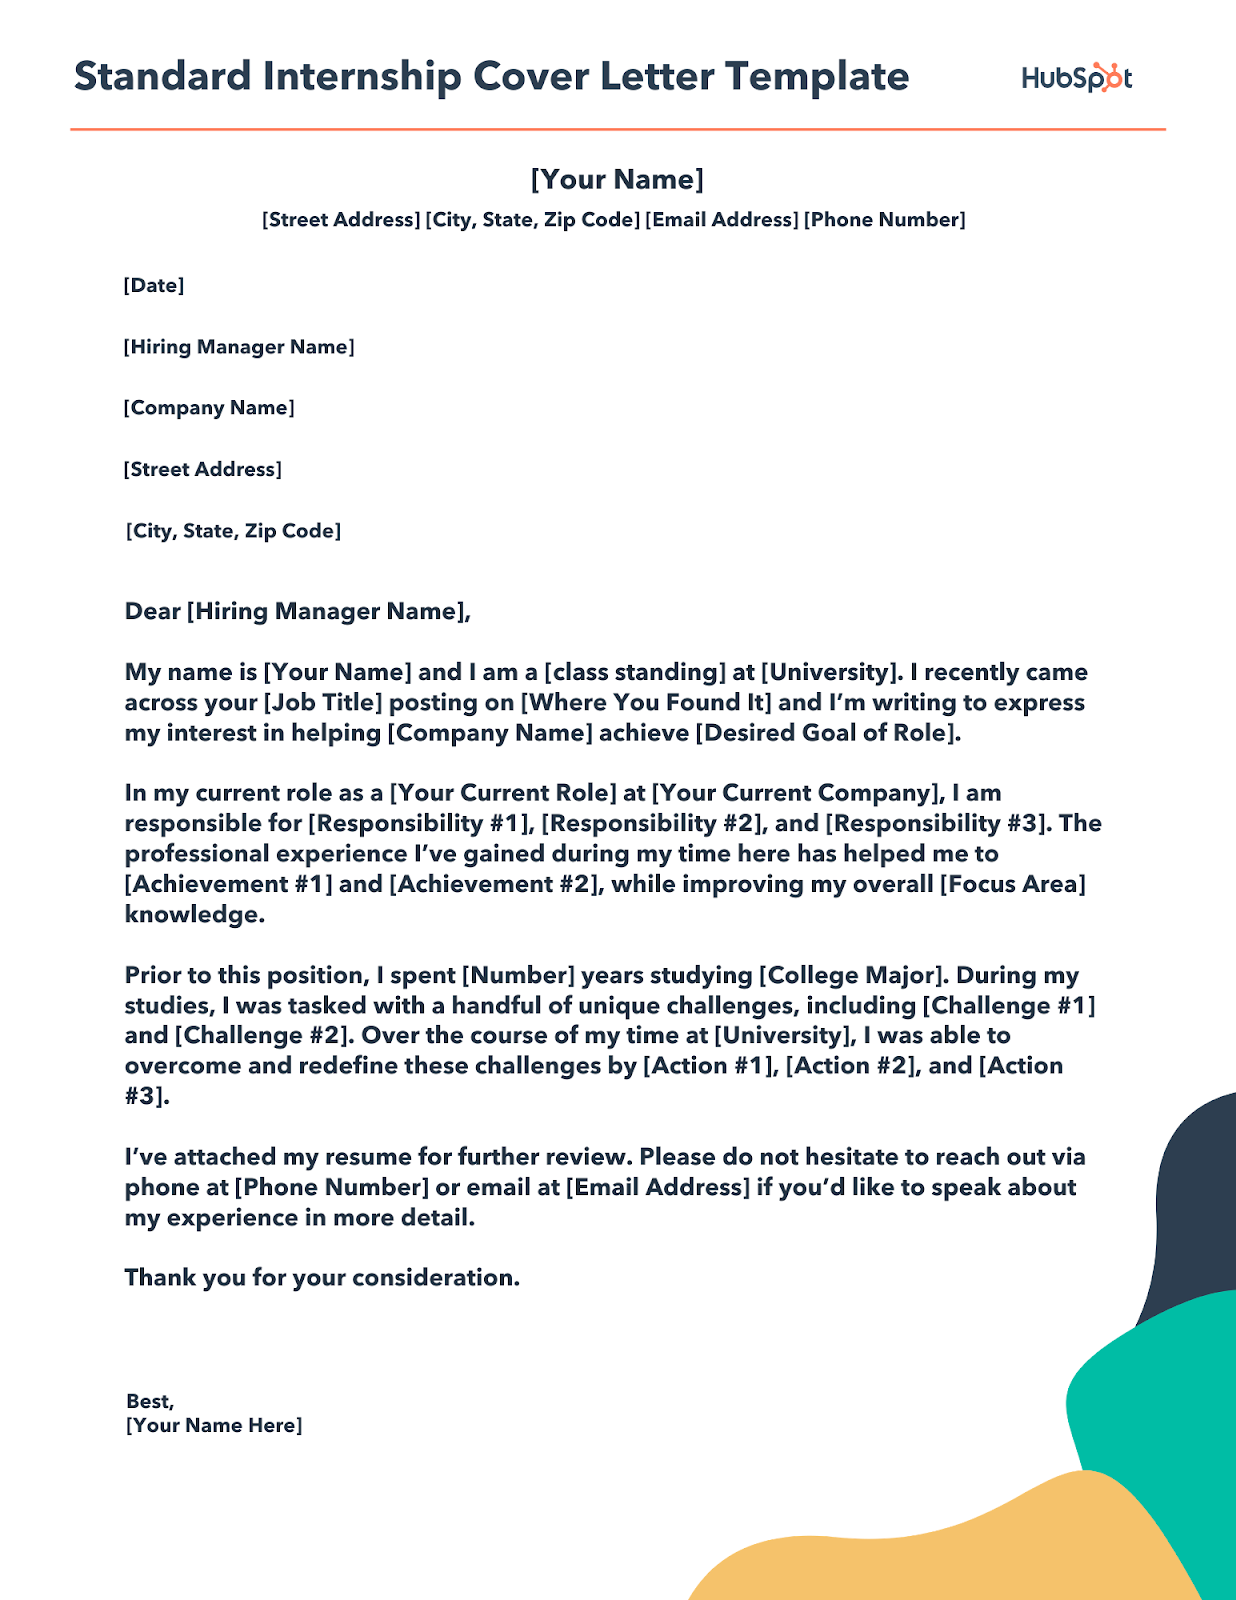 standard internship cover letter template